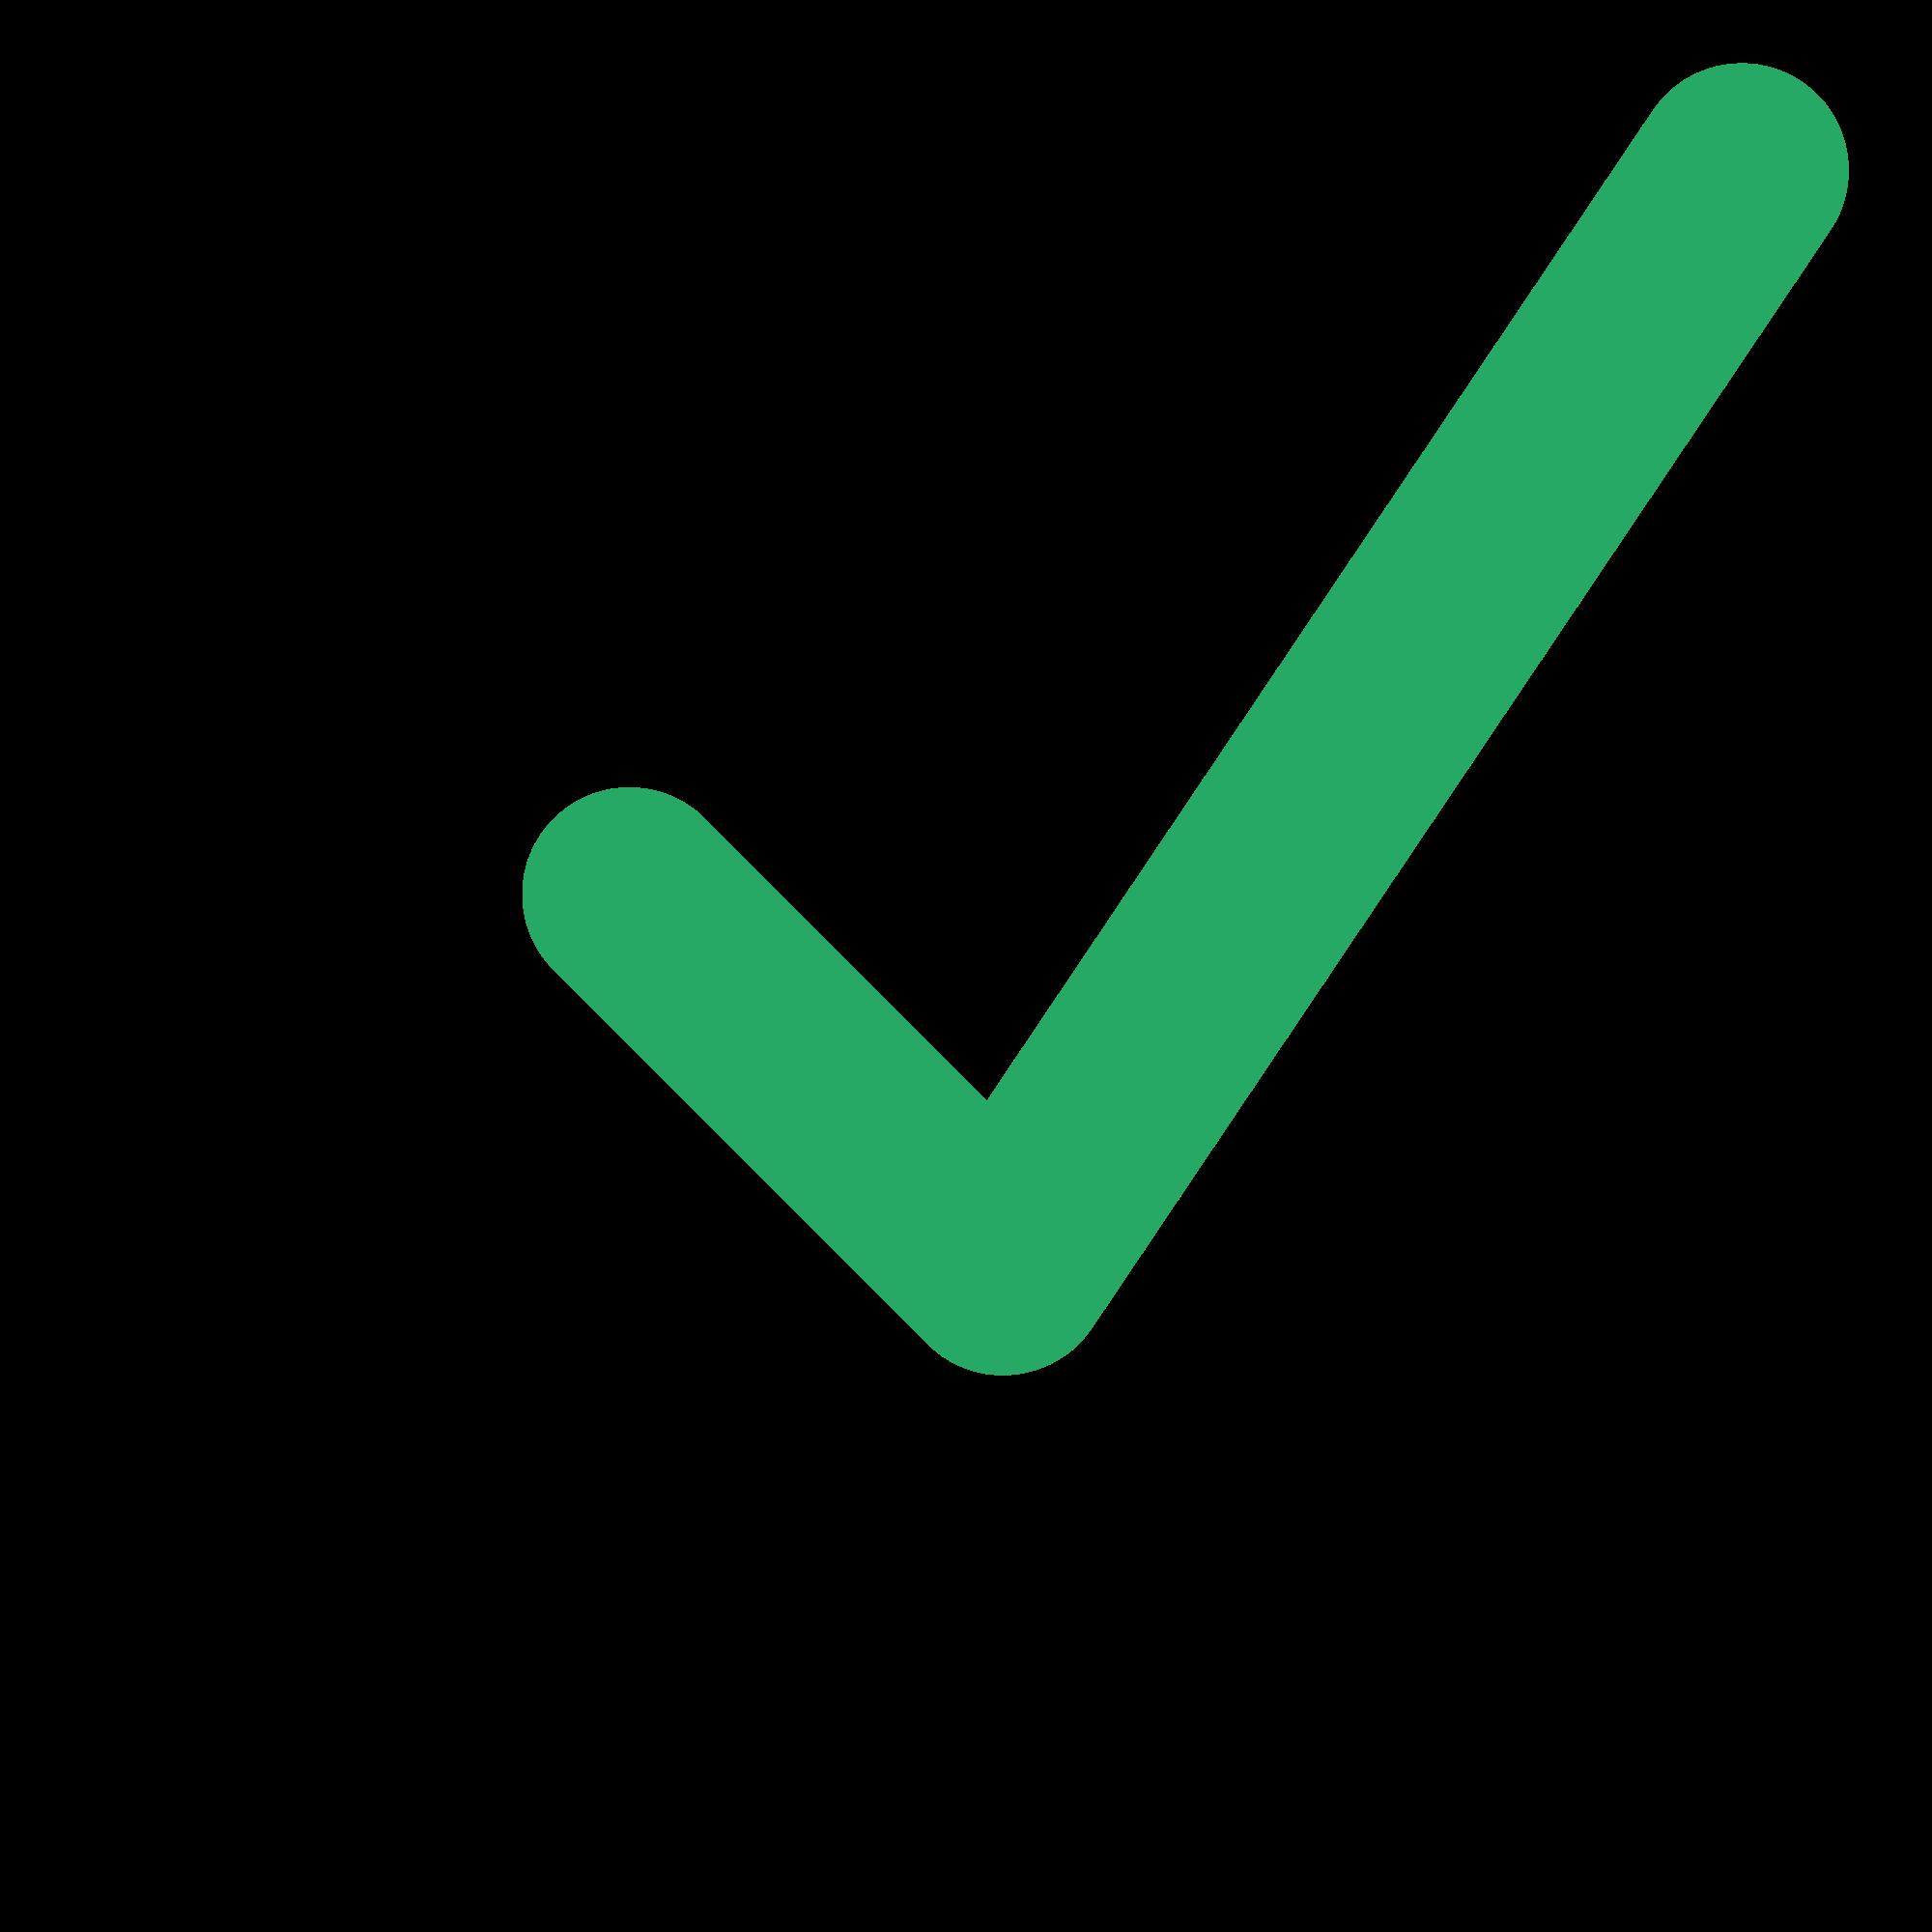 image freeuse stock File echo curation alt. Checkmark clipart endorsement.